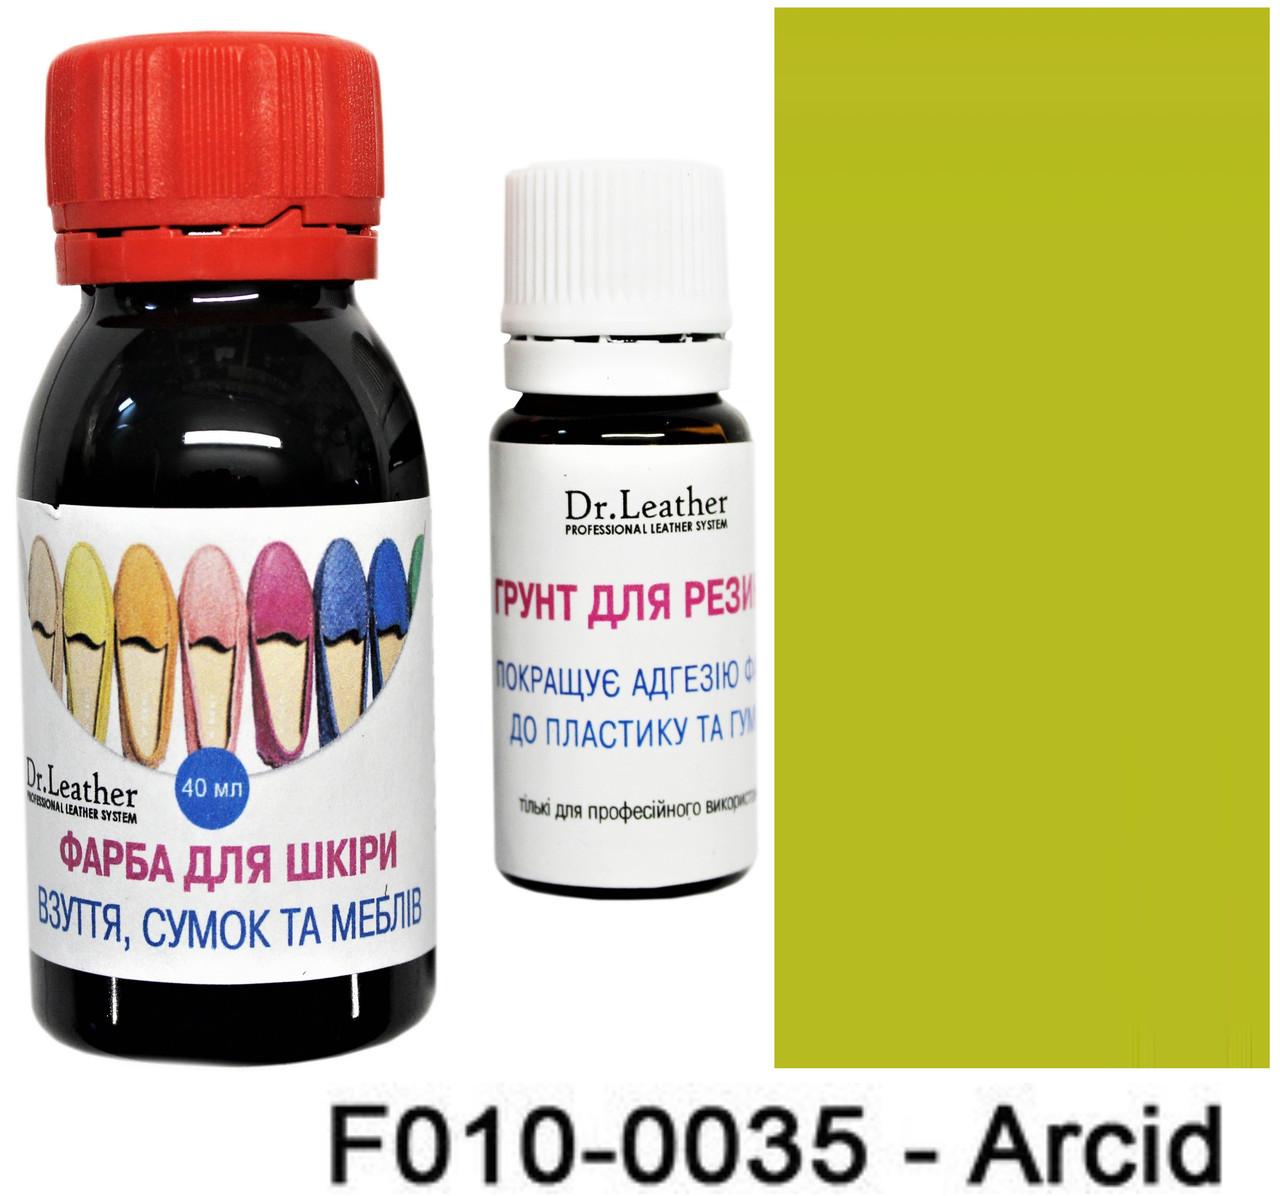 "Краска для подошвы, резины, полиуретана, пластика 40 мл.""Dr.Leather"" ARCID"